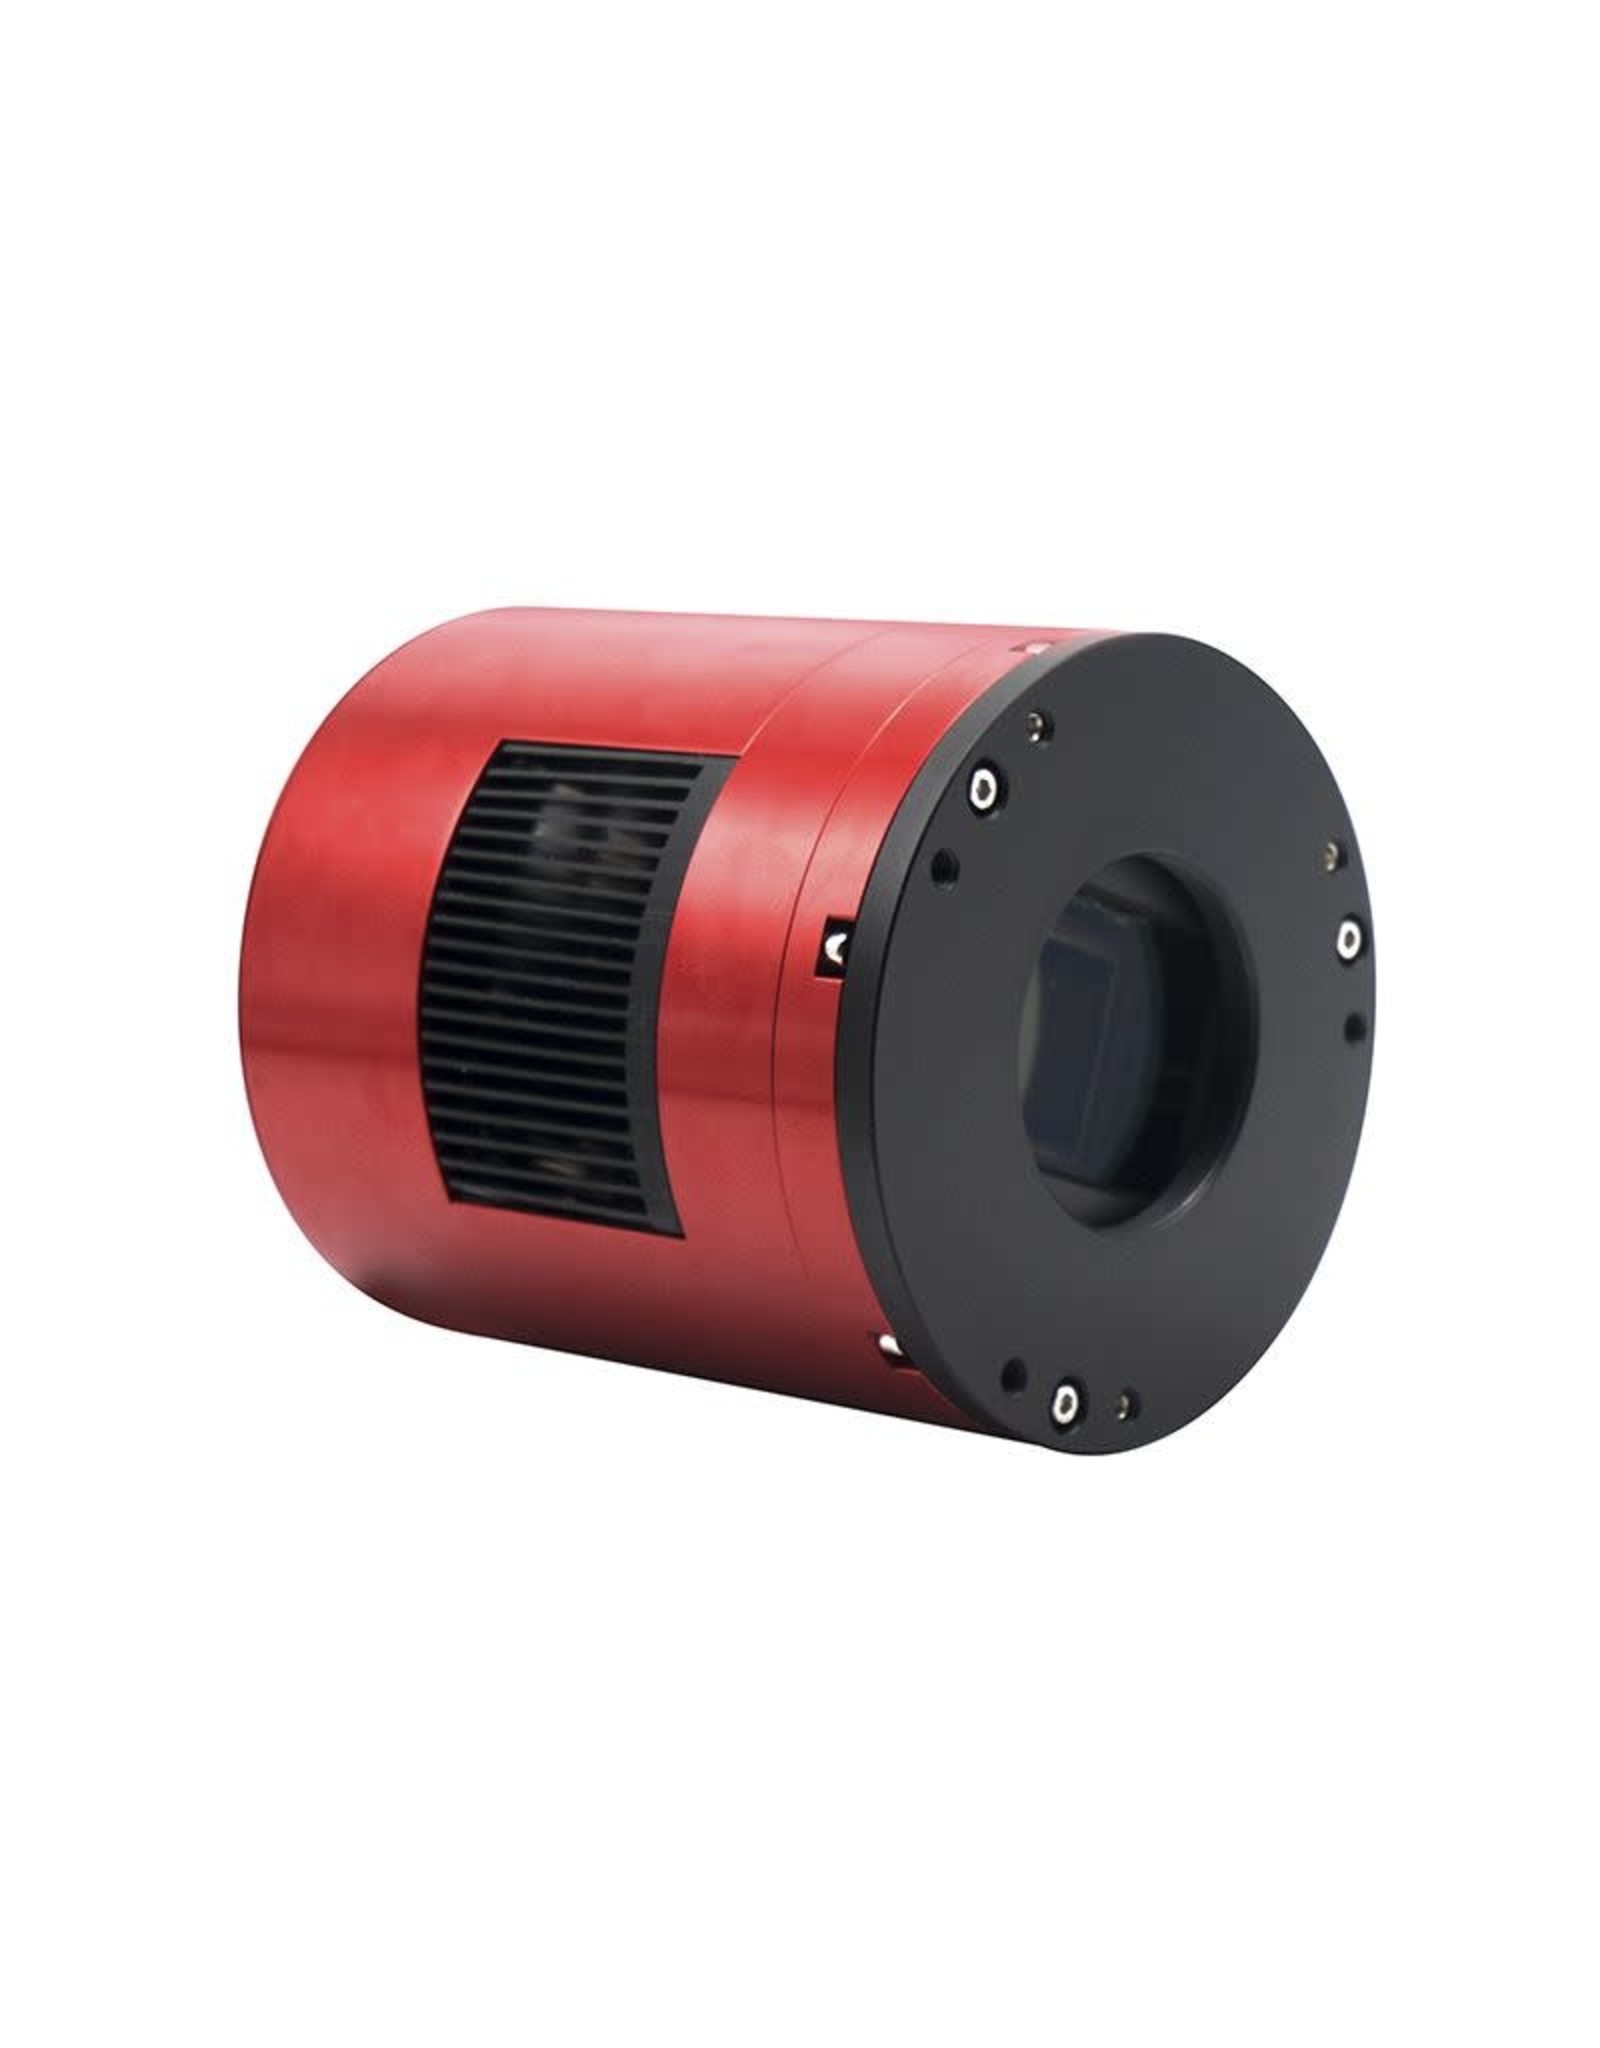 ZWO ZWO ASI2600MC Pro USB3 Cooled Color Camera - ASI2600MC-P